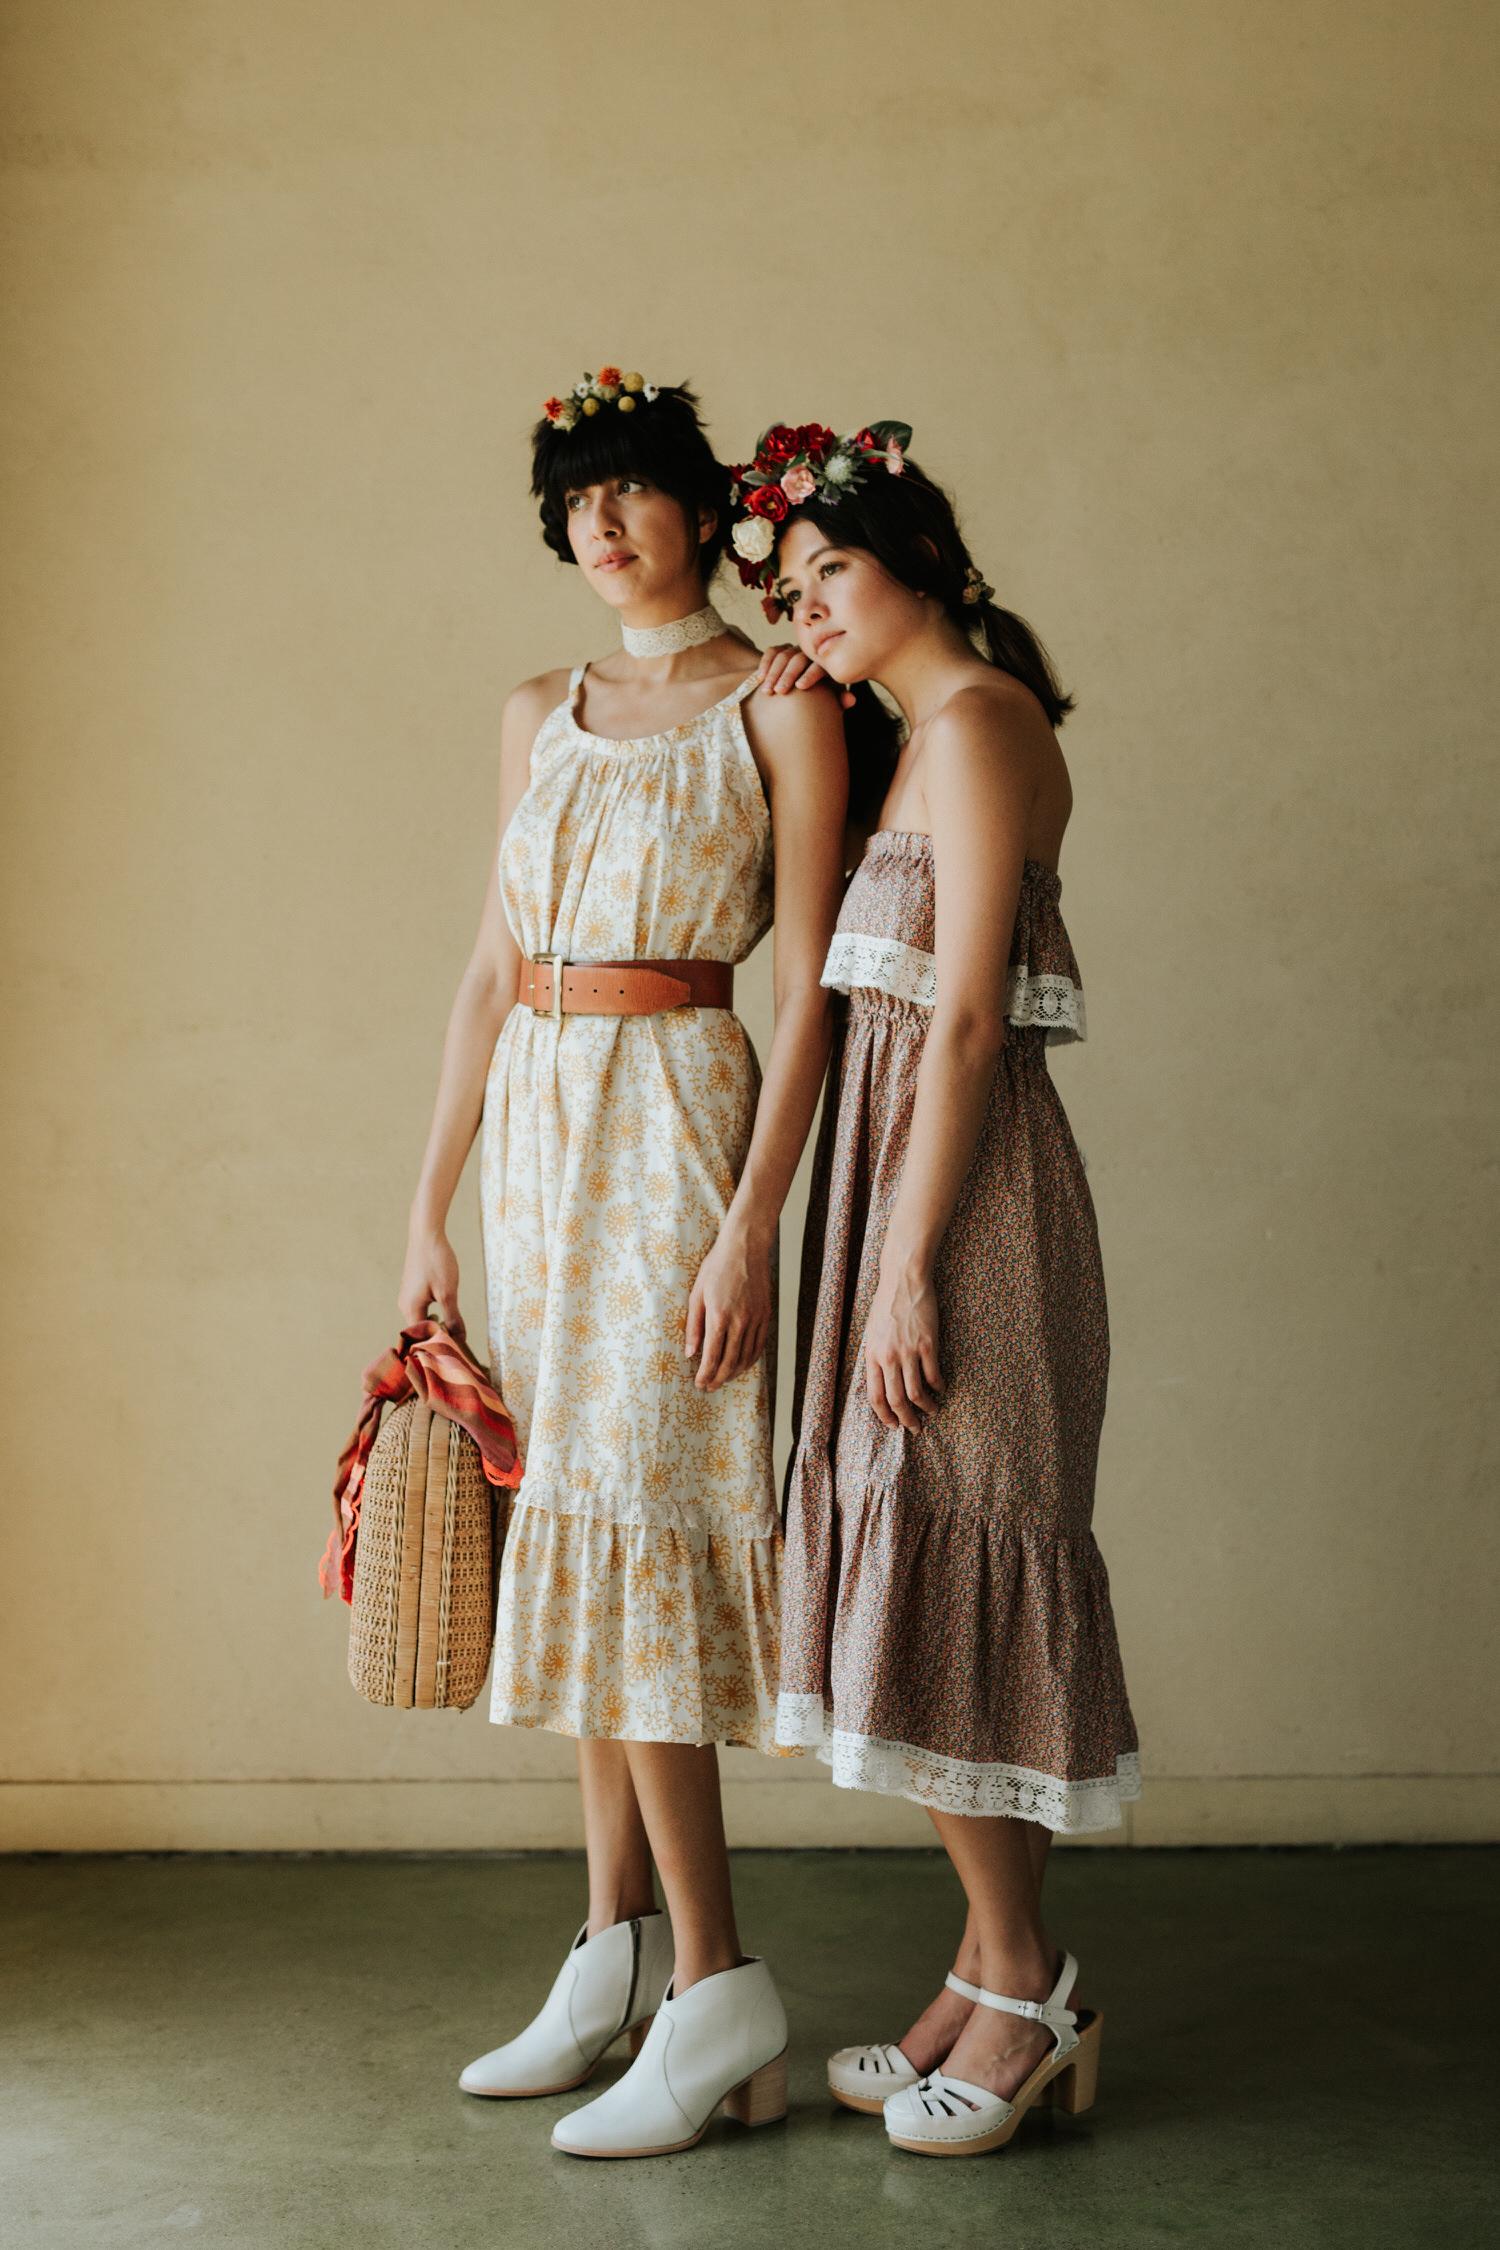 Women in Rat Des Champs vintage clothing